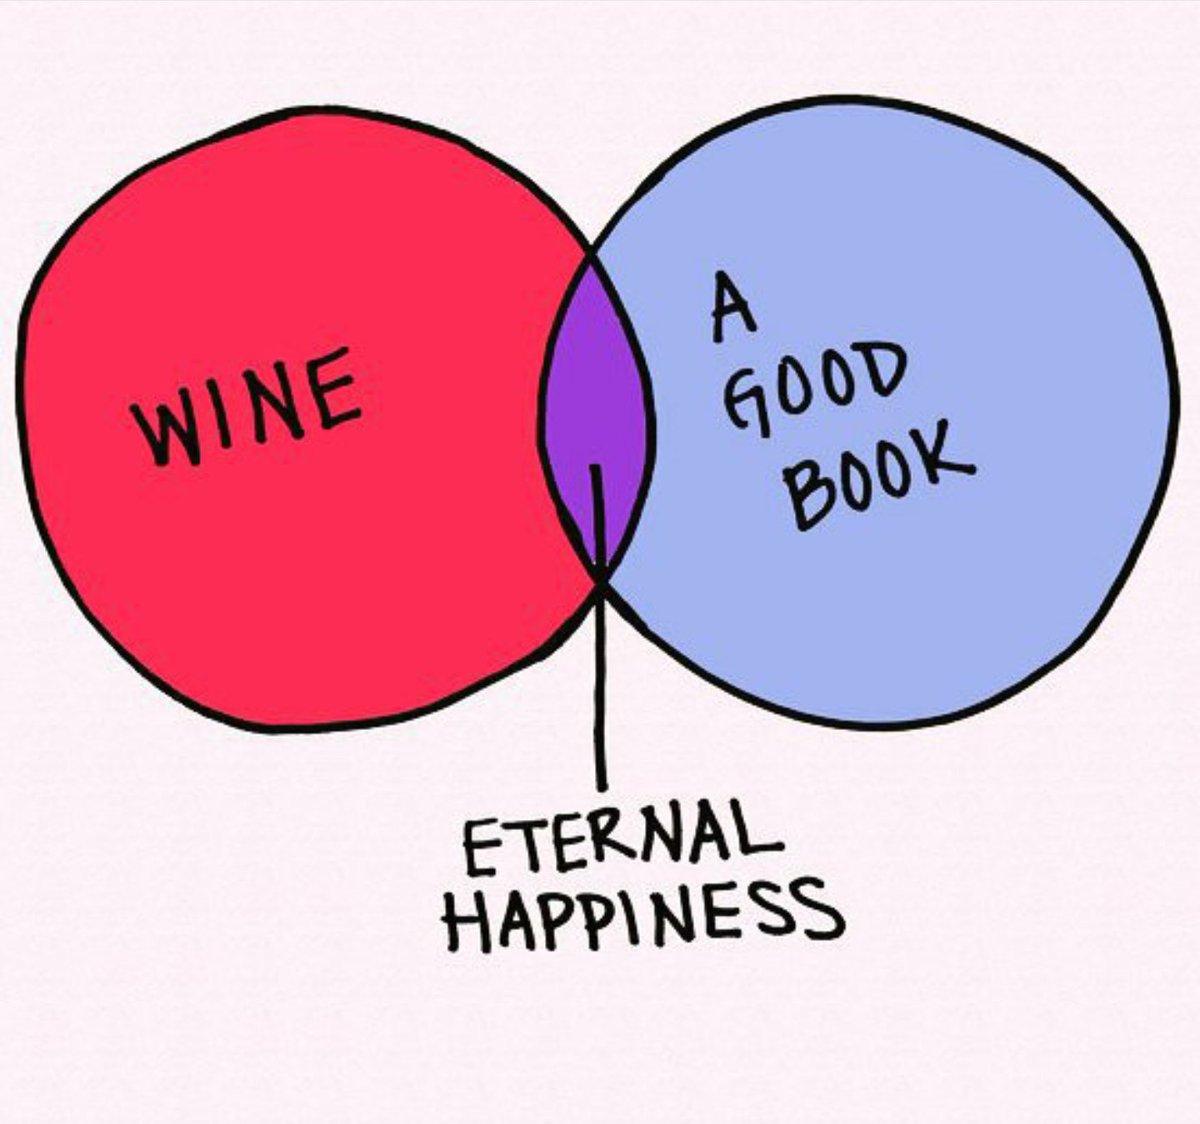 YESSS!!!  RT @alawine: The good place! RT @winewankers: #wine https://t.co/uACNGzi9DJ